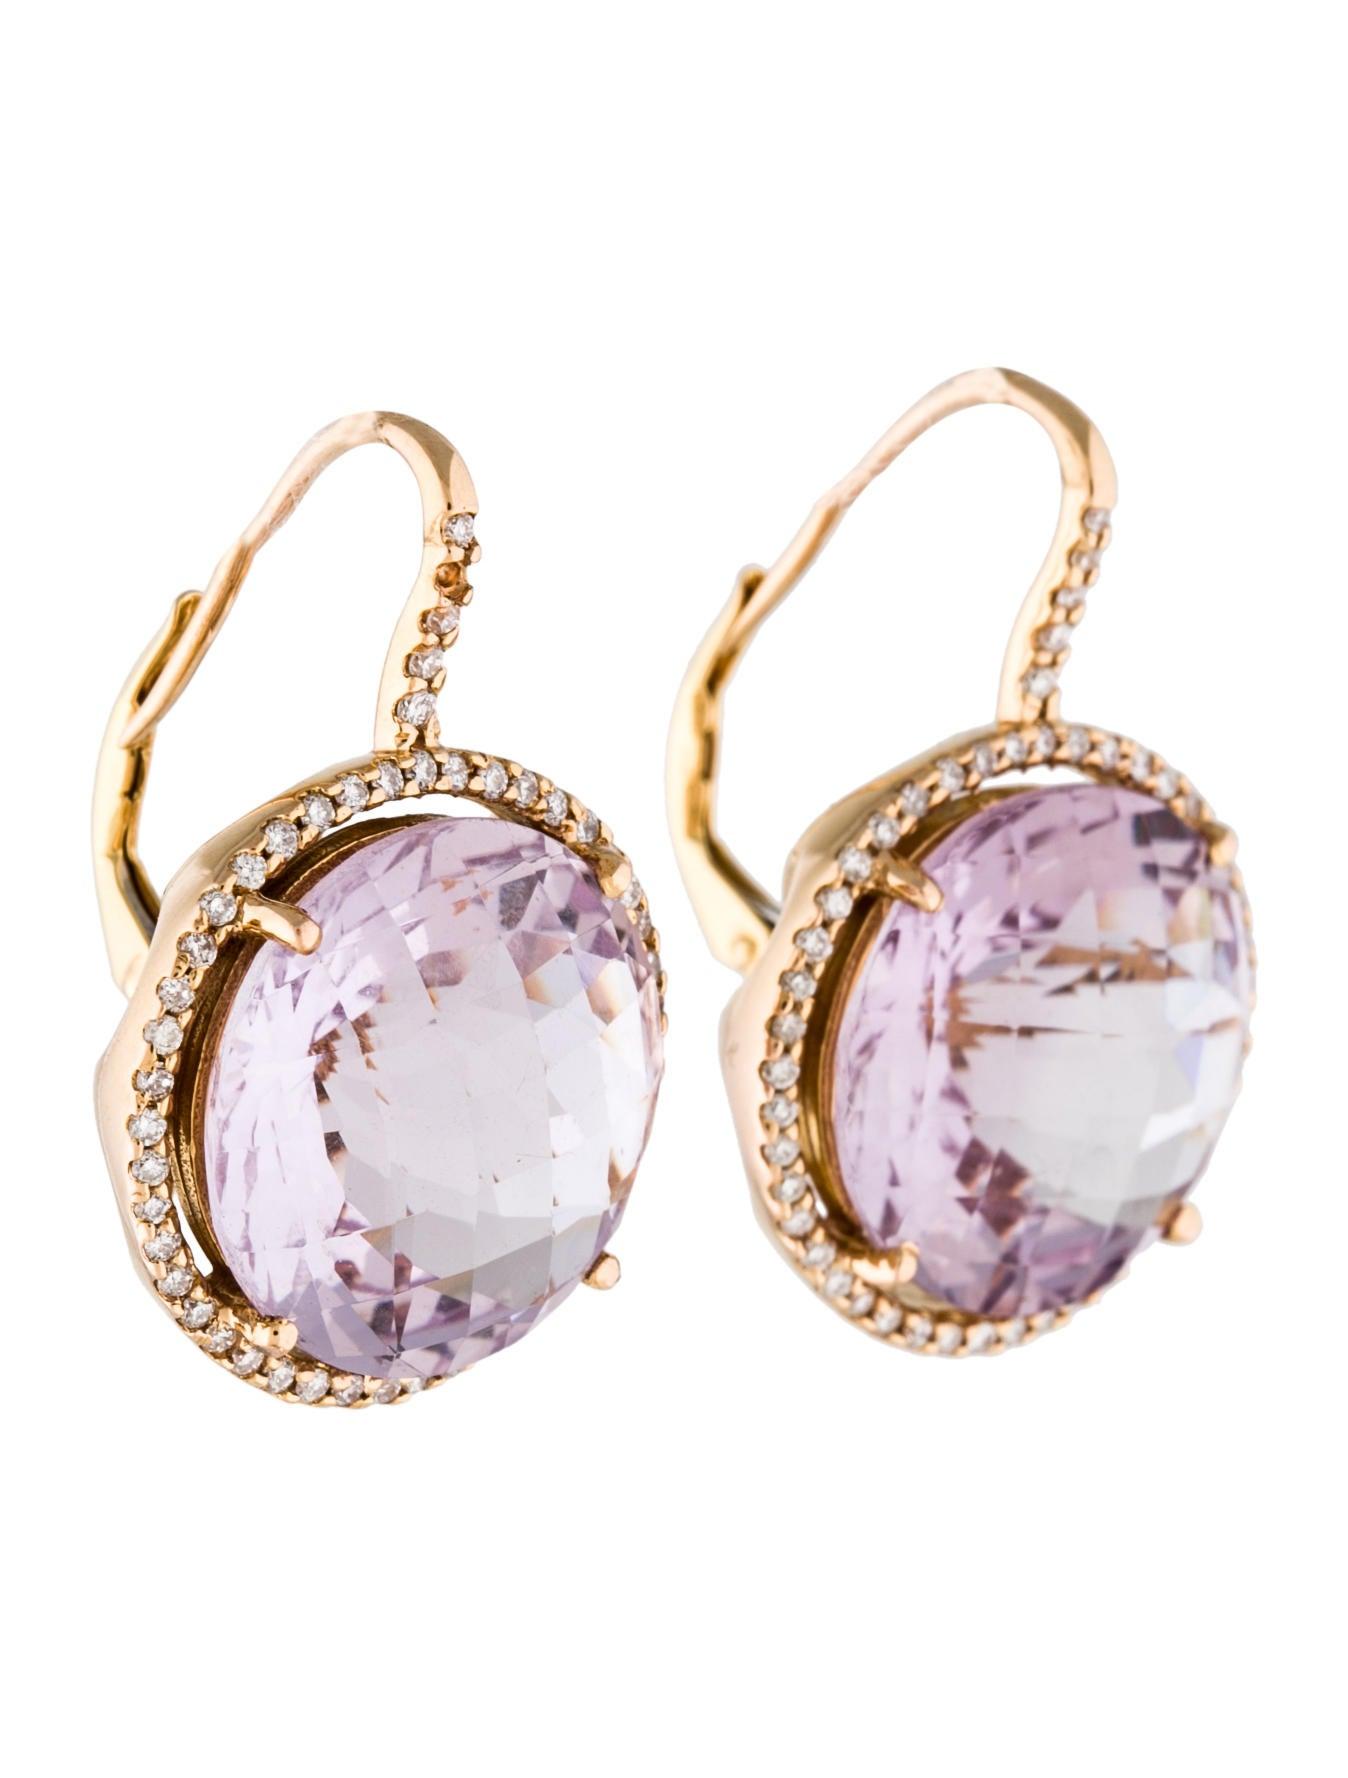 18k Amethyst & Diamond Earrings  Earrings  Earri35487. Trophy Medallion. Mexican Medallion. Clip Art Medallion. Medal Ceremony Medallion. Gold Necklace Medallion. Finger Ring Medallion. Large Gold Medallion. Gold Plated Medallion